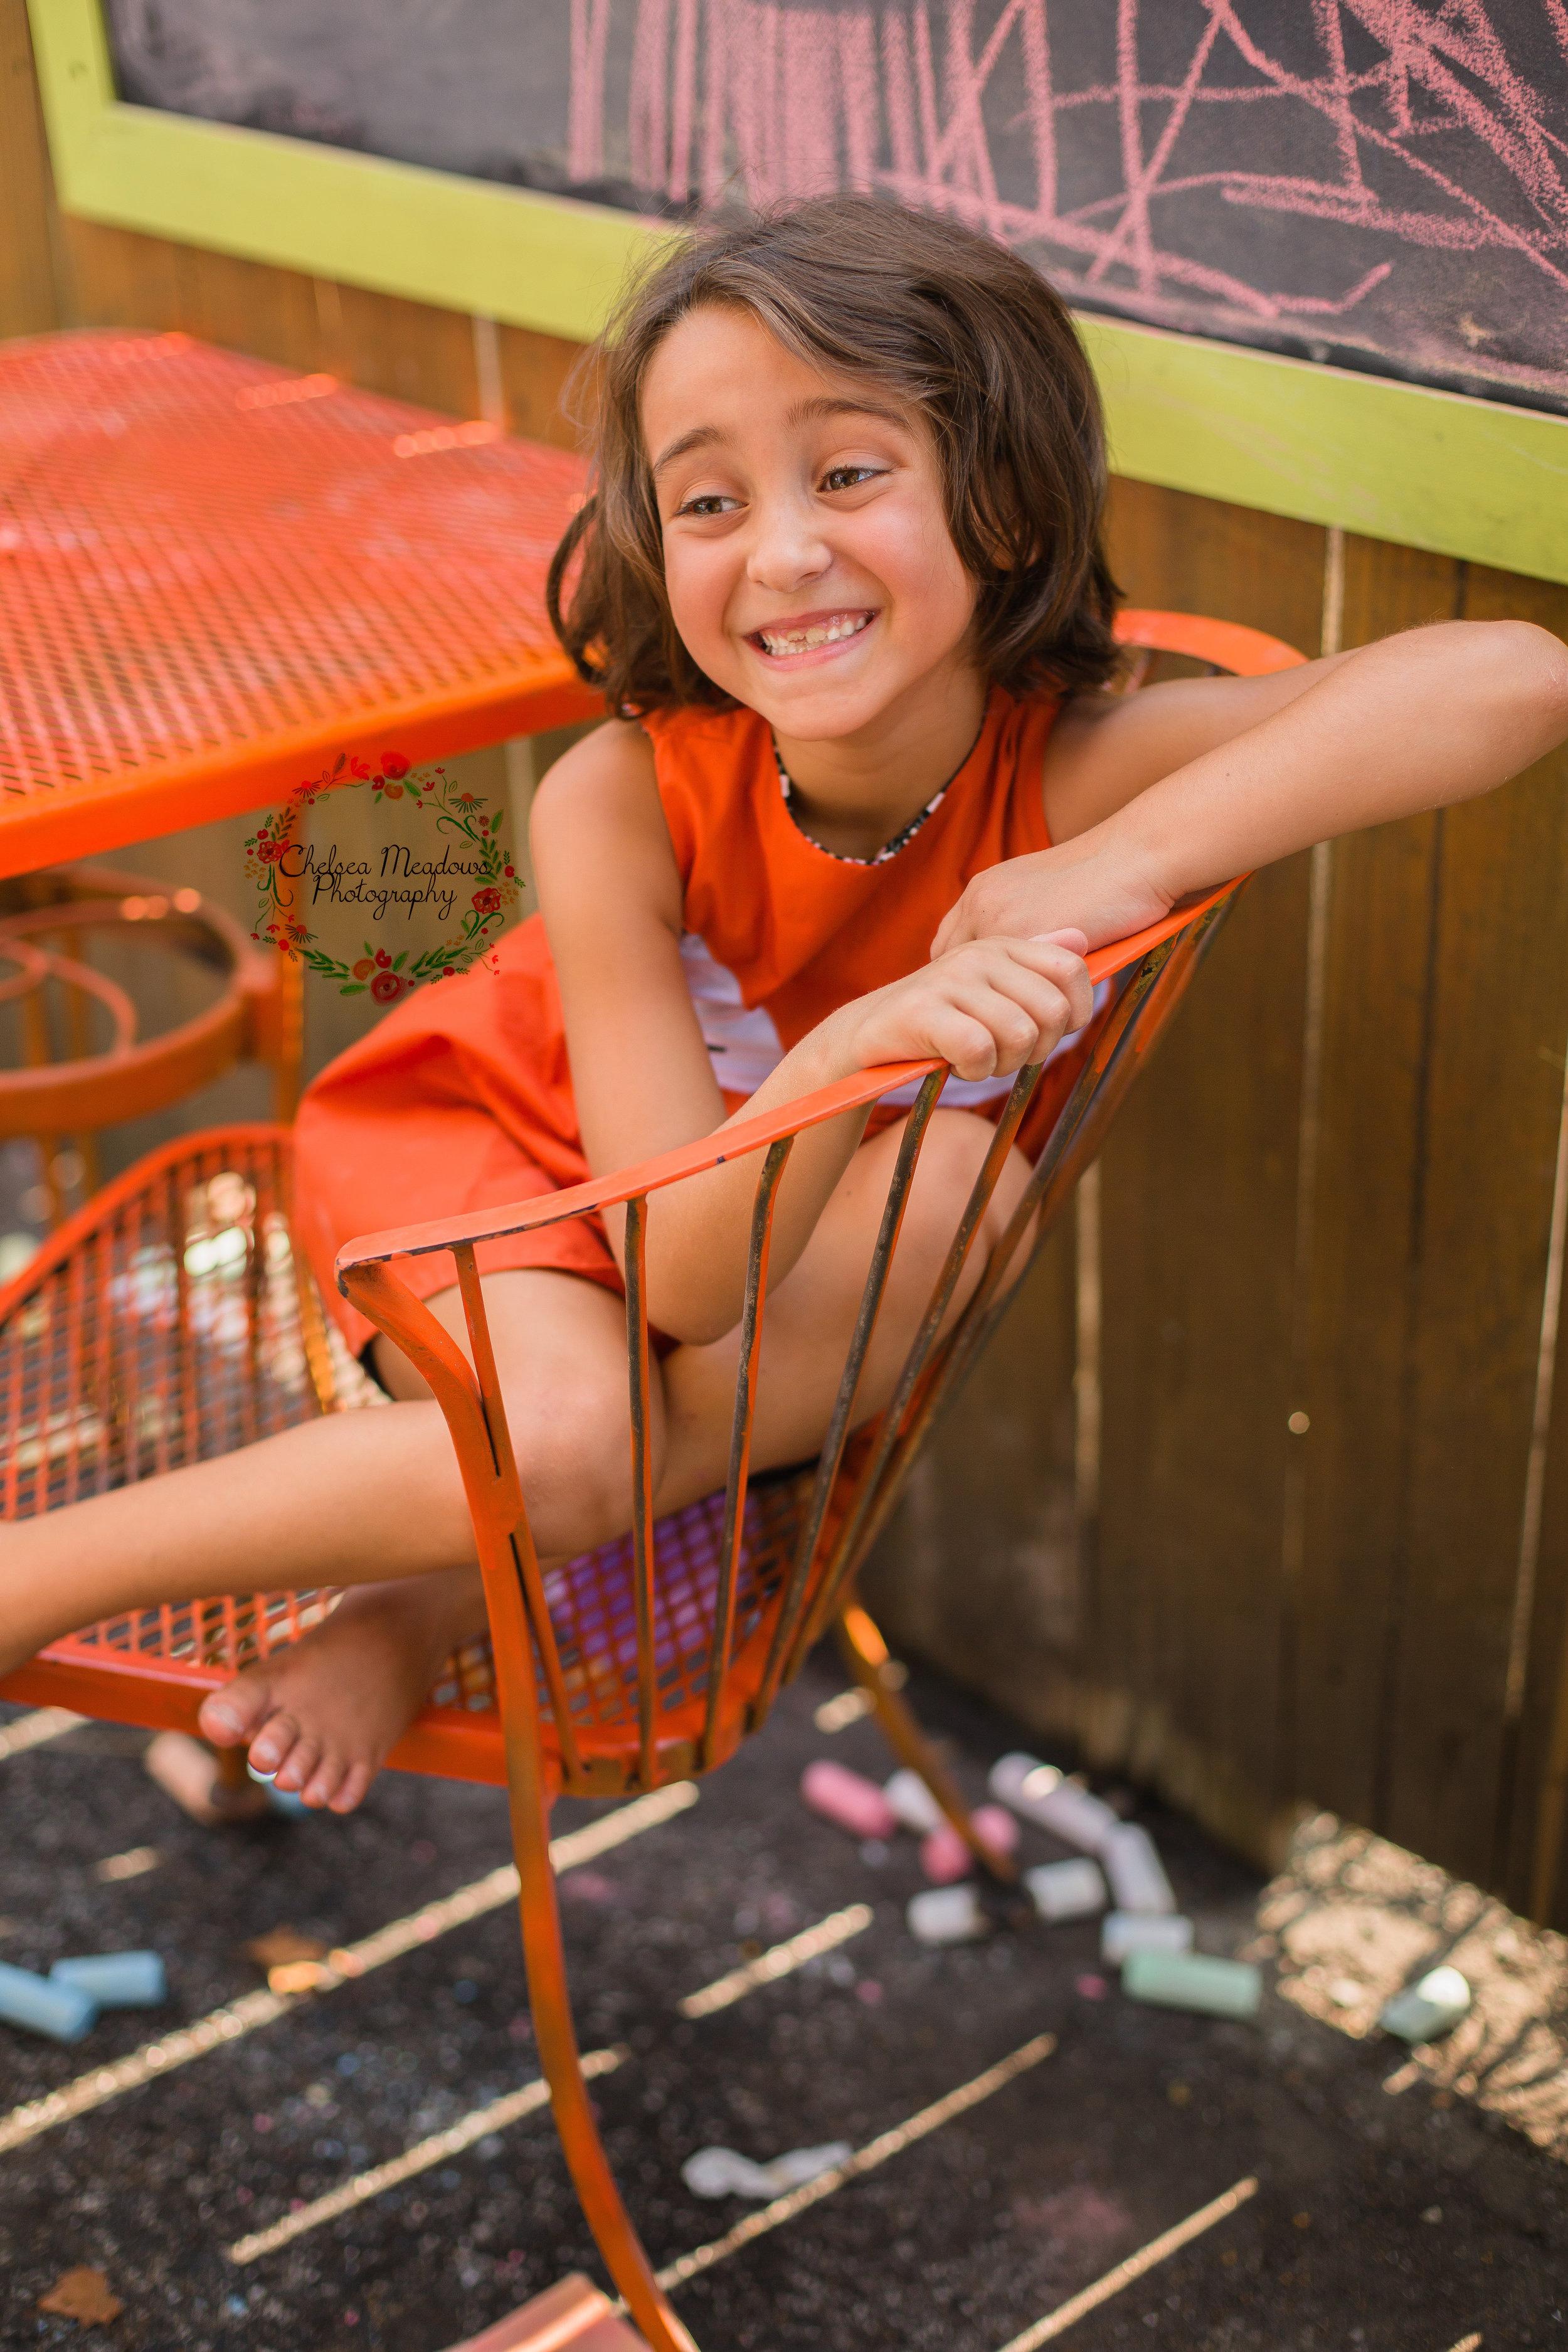 Izzy Family Photoshoot - Nashville Family Photographer - Chelsea Meadows Photography (24).jpg